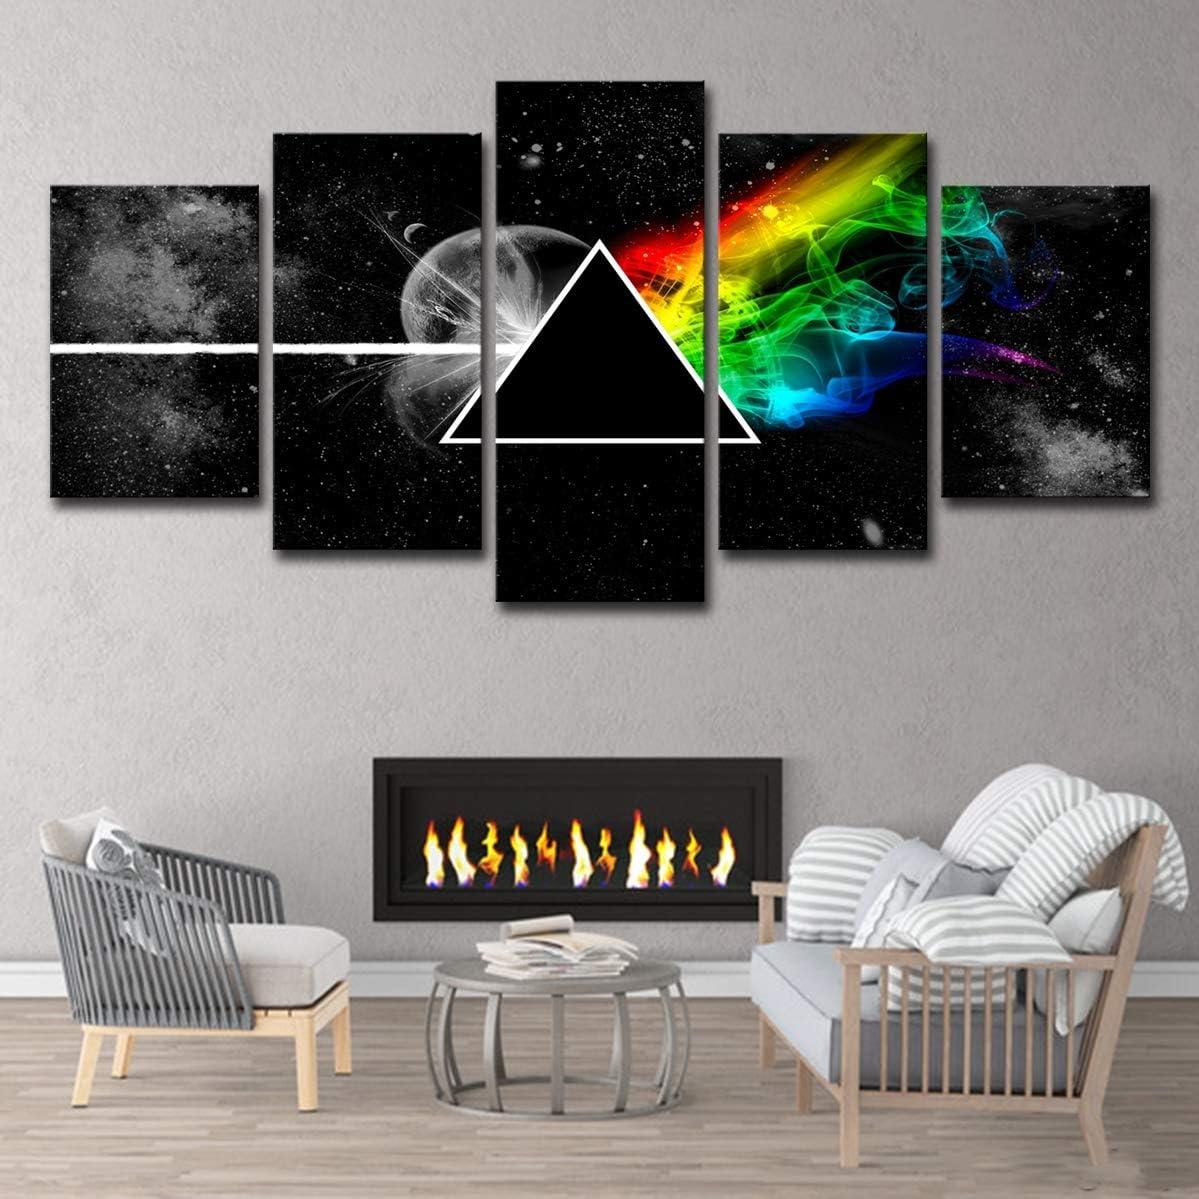 Amazon Com Sgkhz Canvas Wall Art Poster Modular Canvas Hd Prints